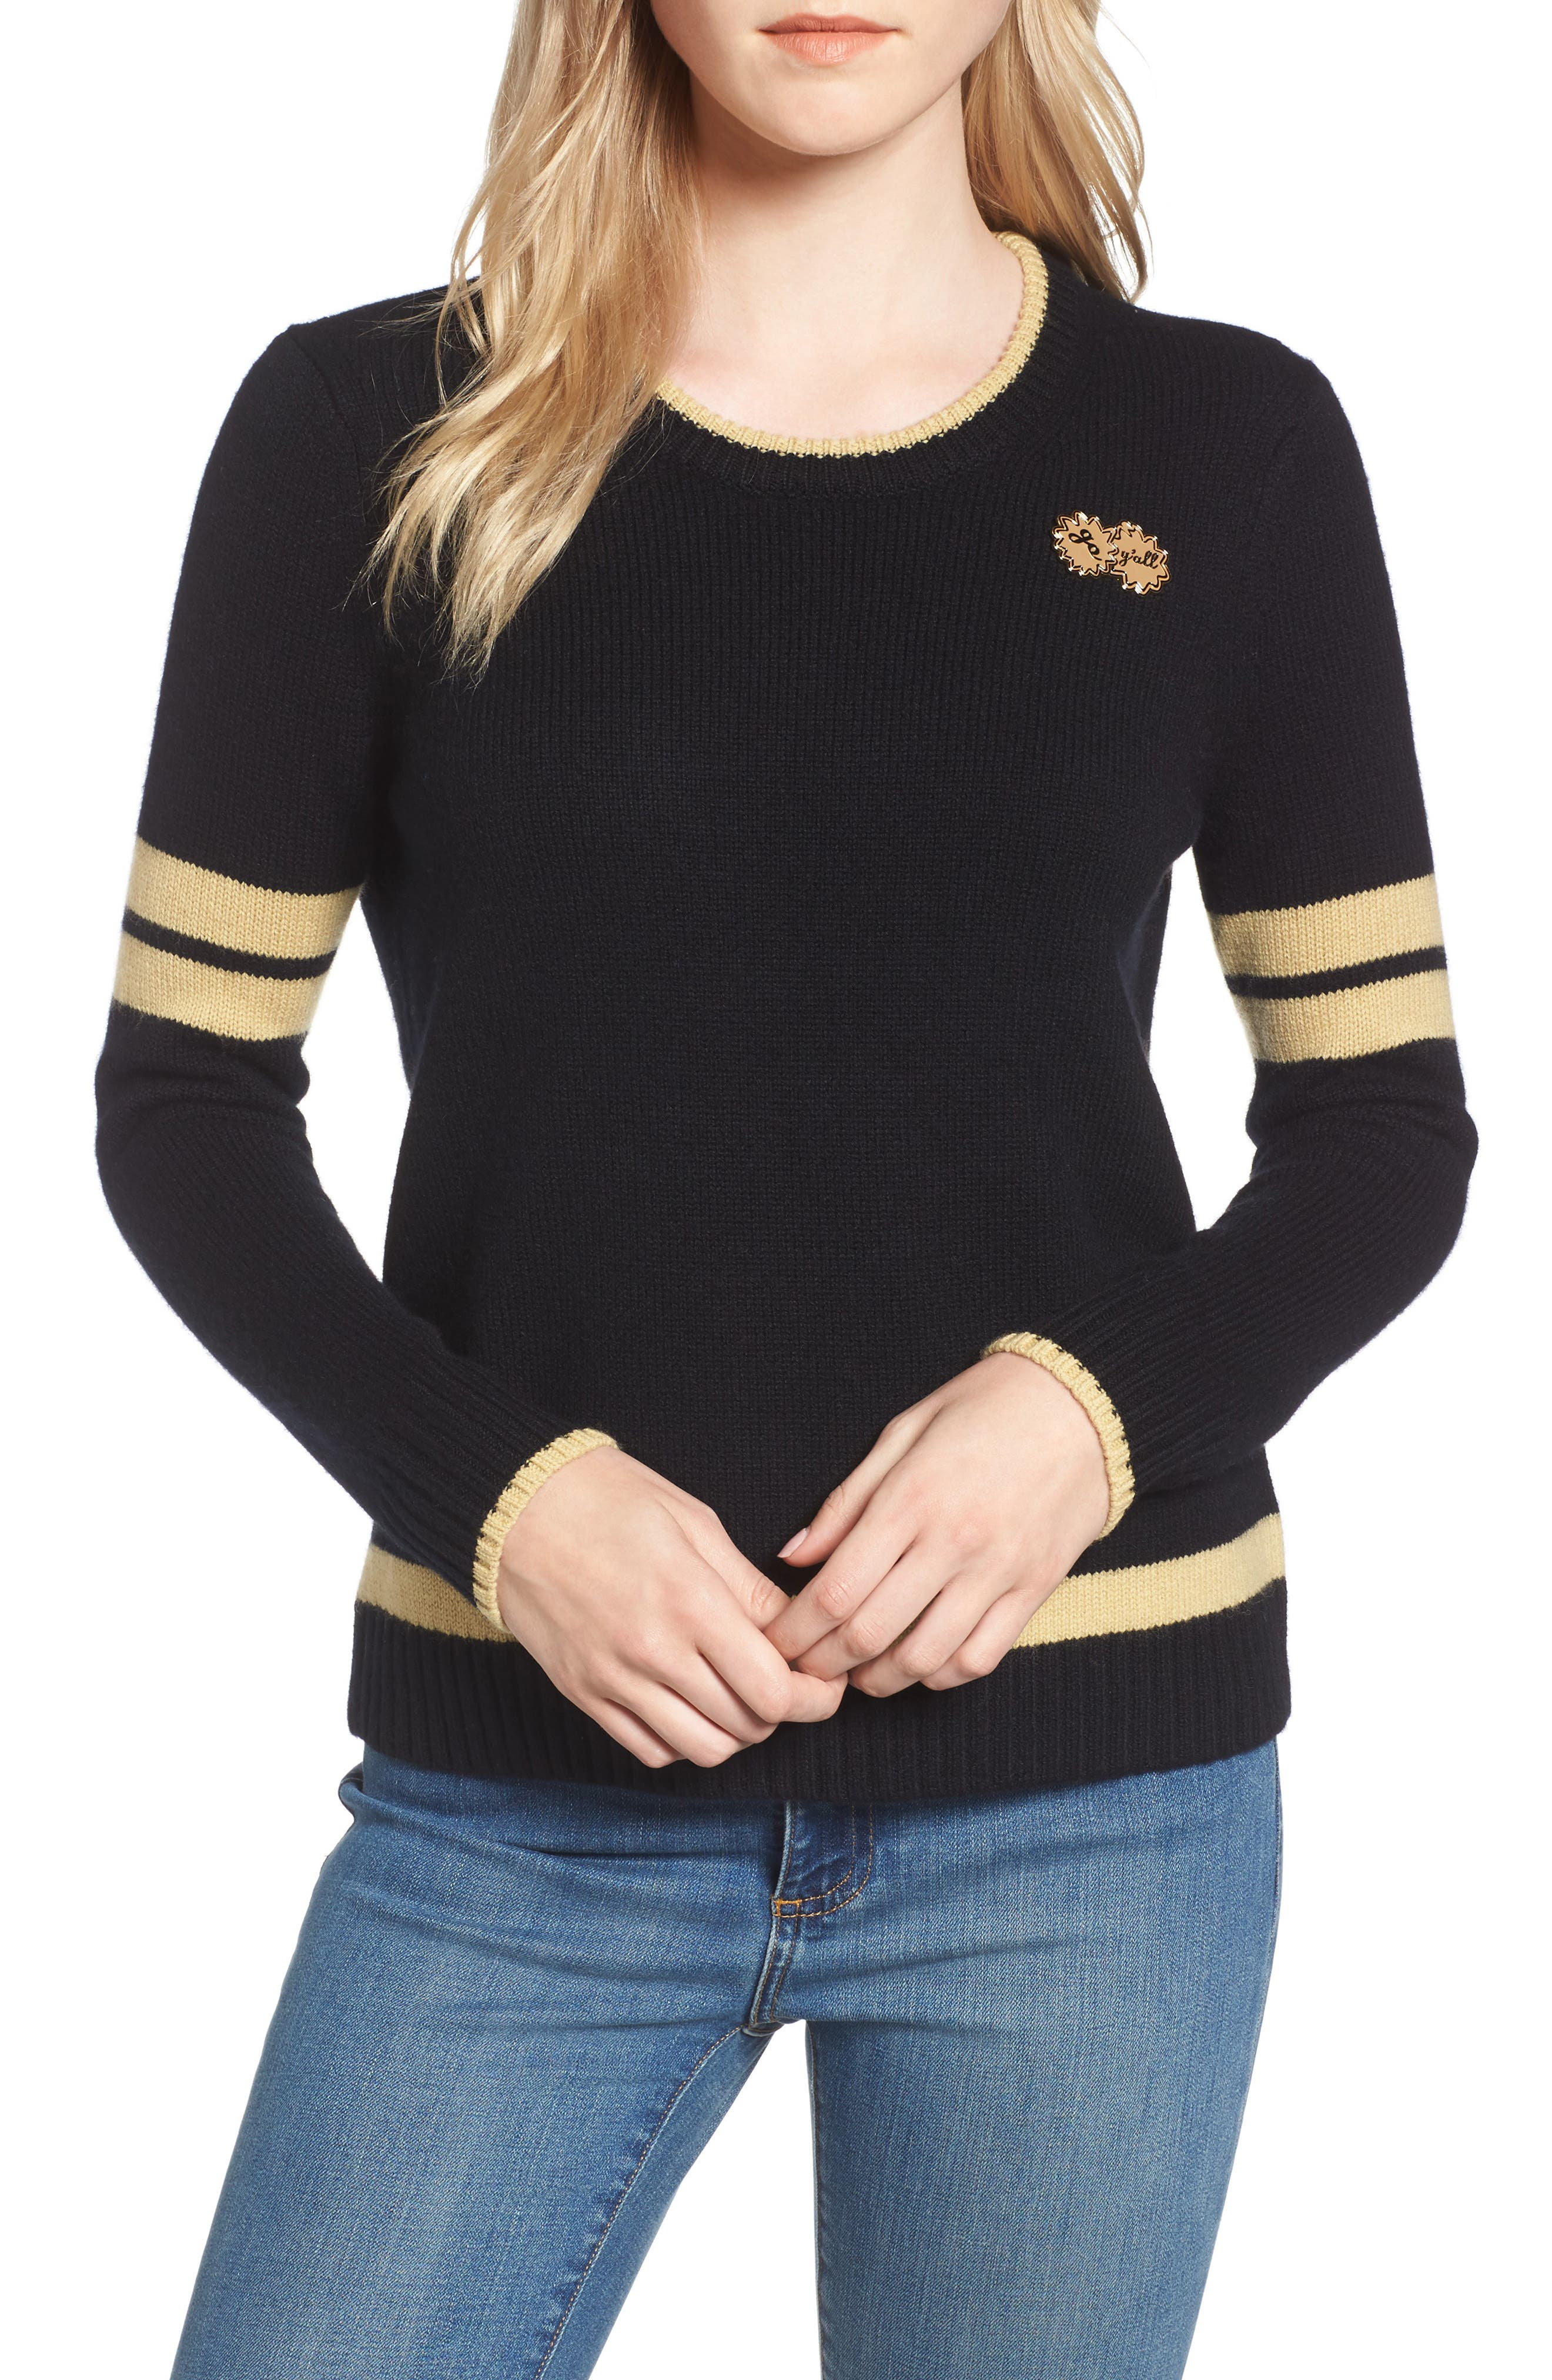 Spirit Sweater,                         Main,                         color, Black/ Gold